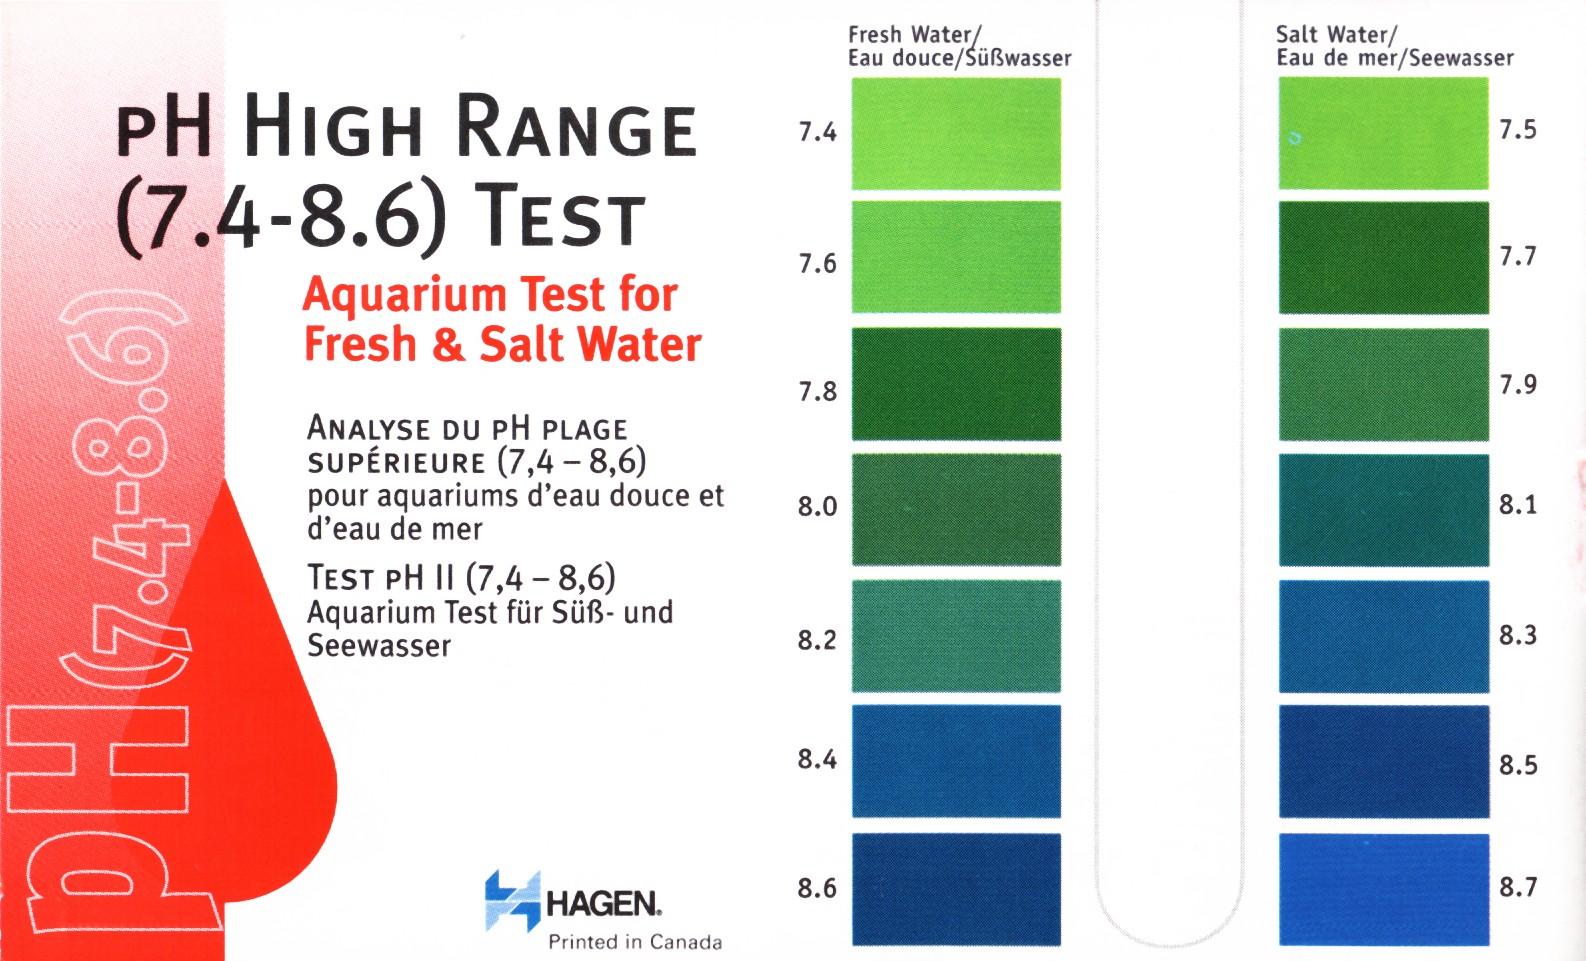 Hagen marina air pump 75, - компрессор хаген марина